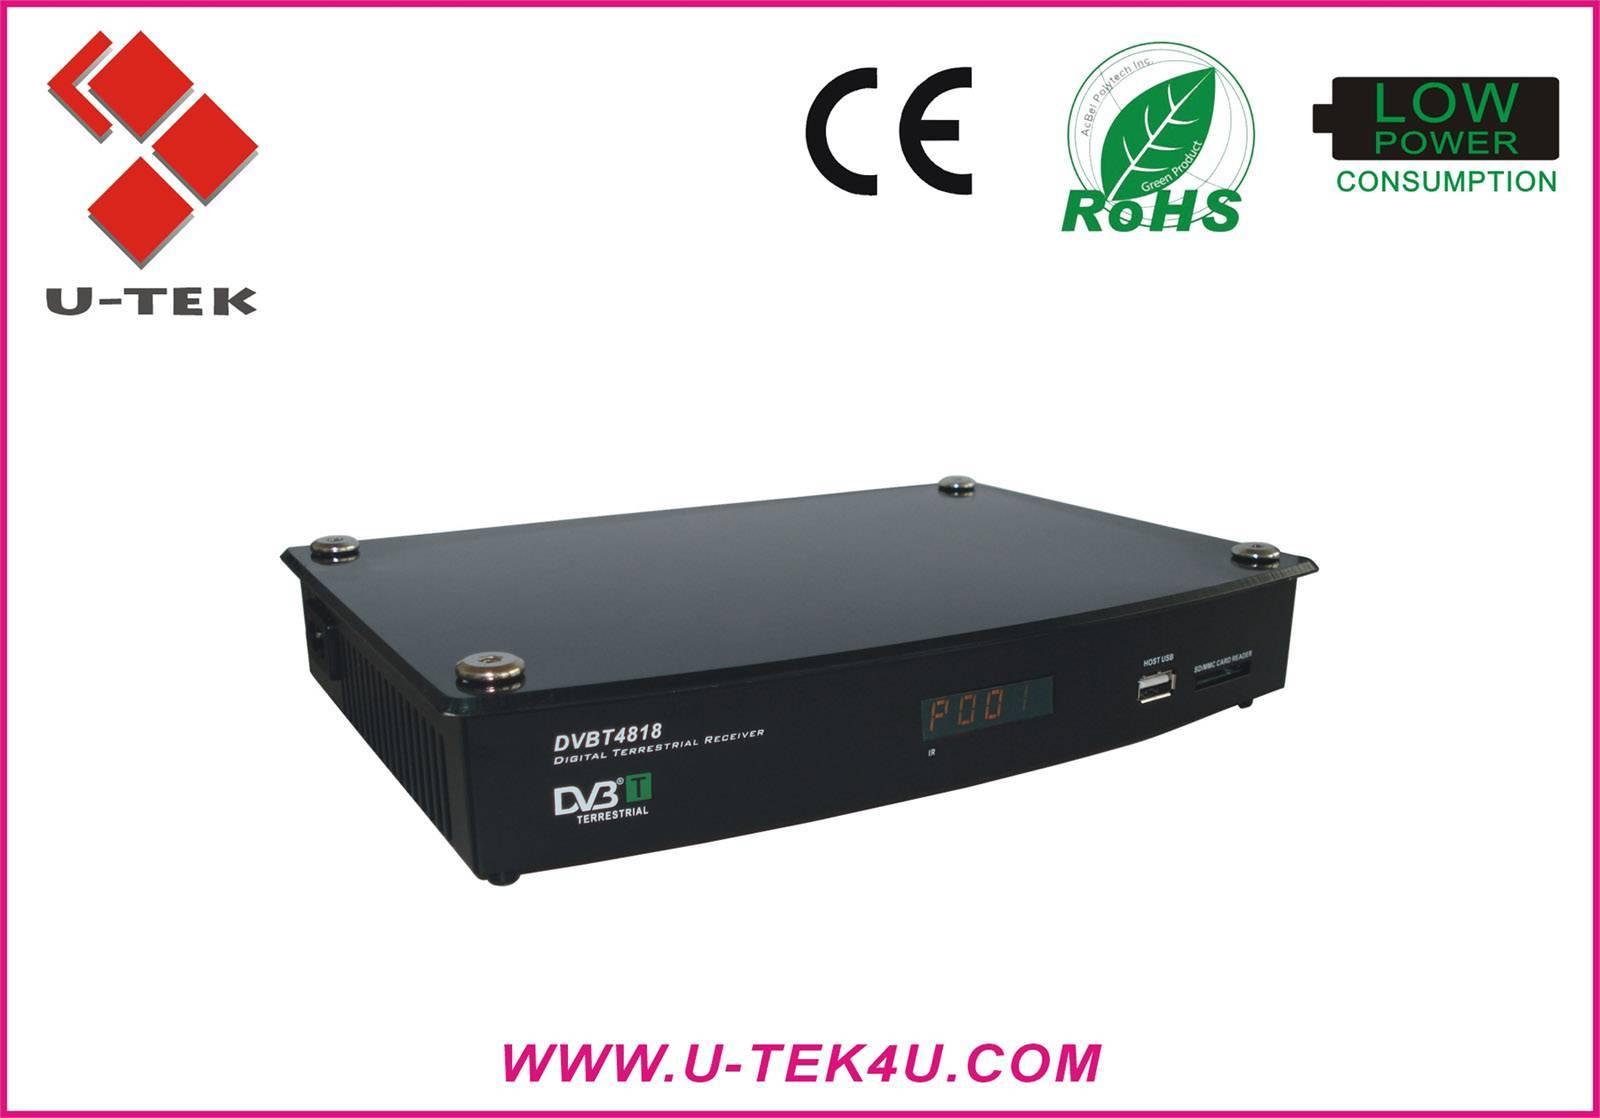 Special Offer, Two Scart Mpeg2 DVB-T Receiver, PVR, DVBT4818